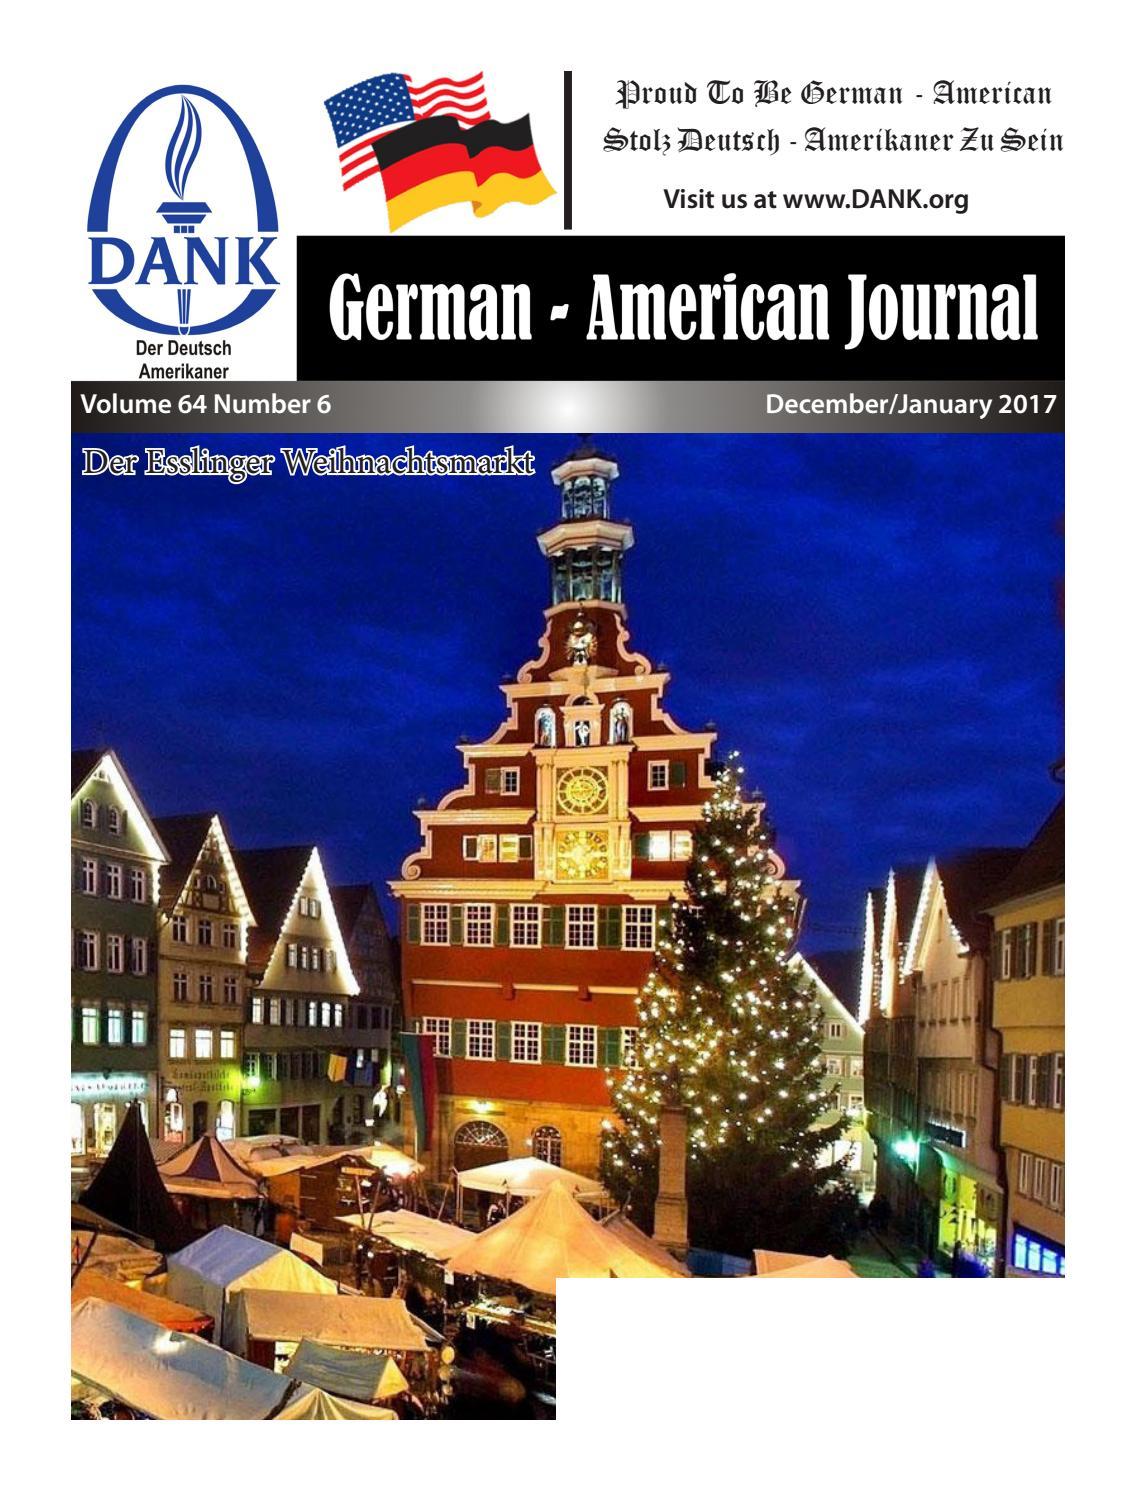 Dank journal dec jan 2016 by DANK Journal - issuu